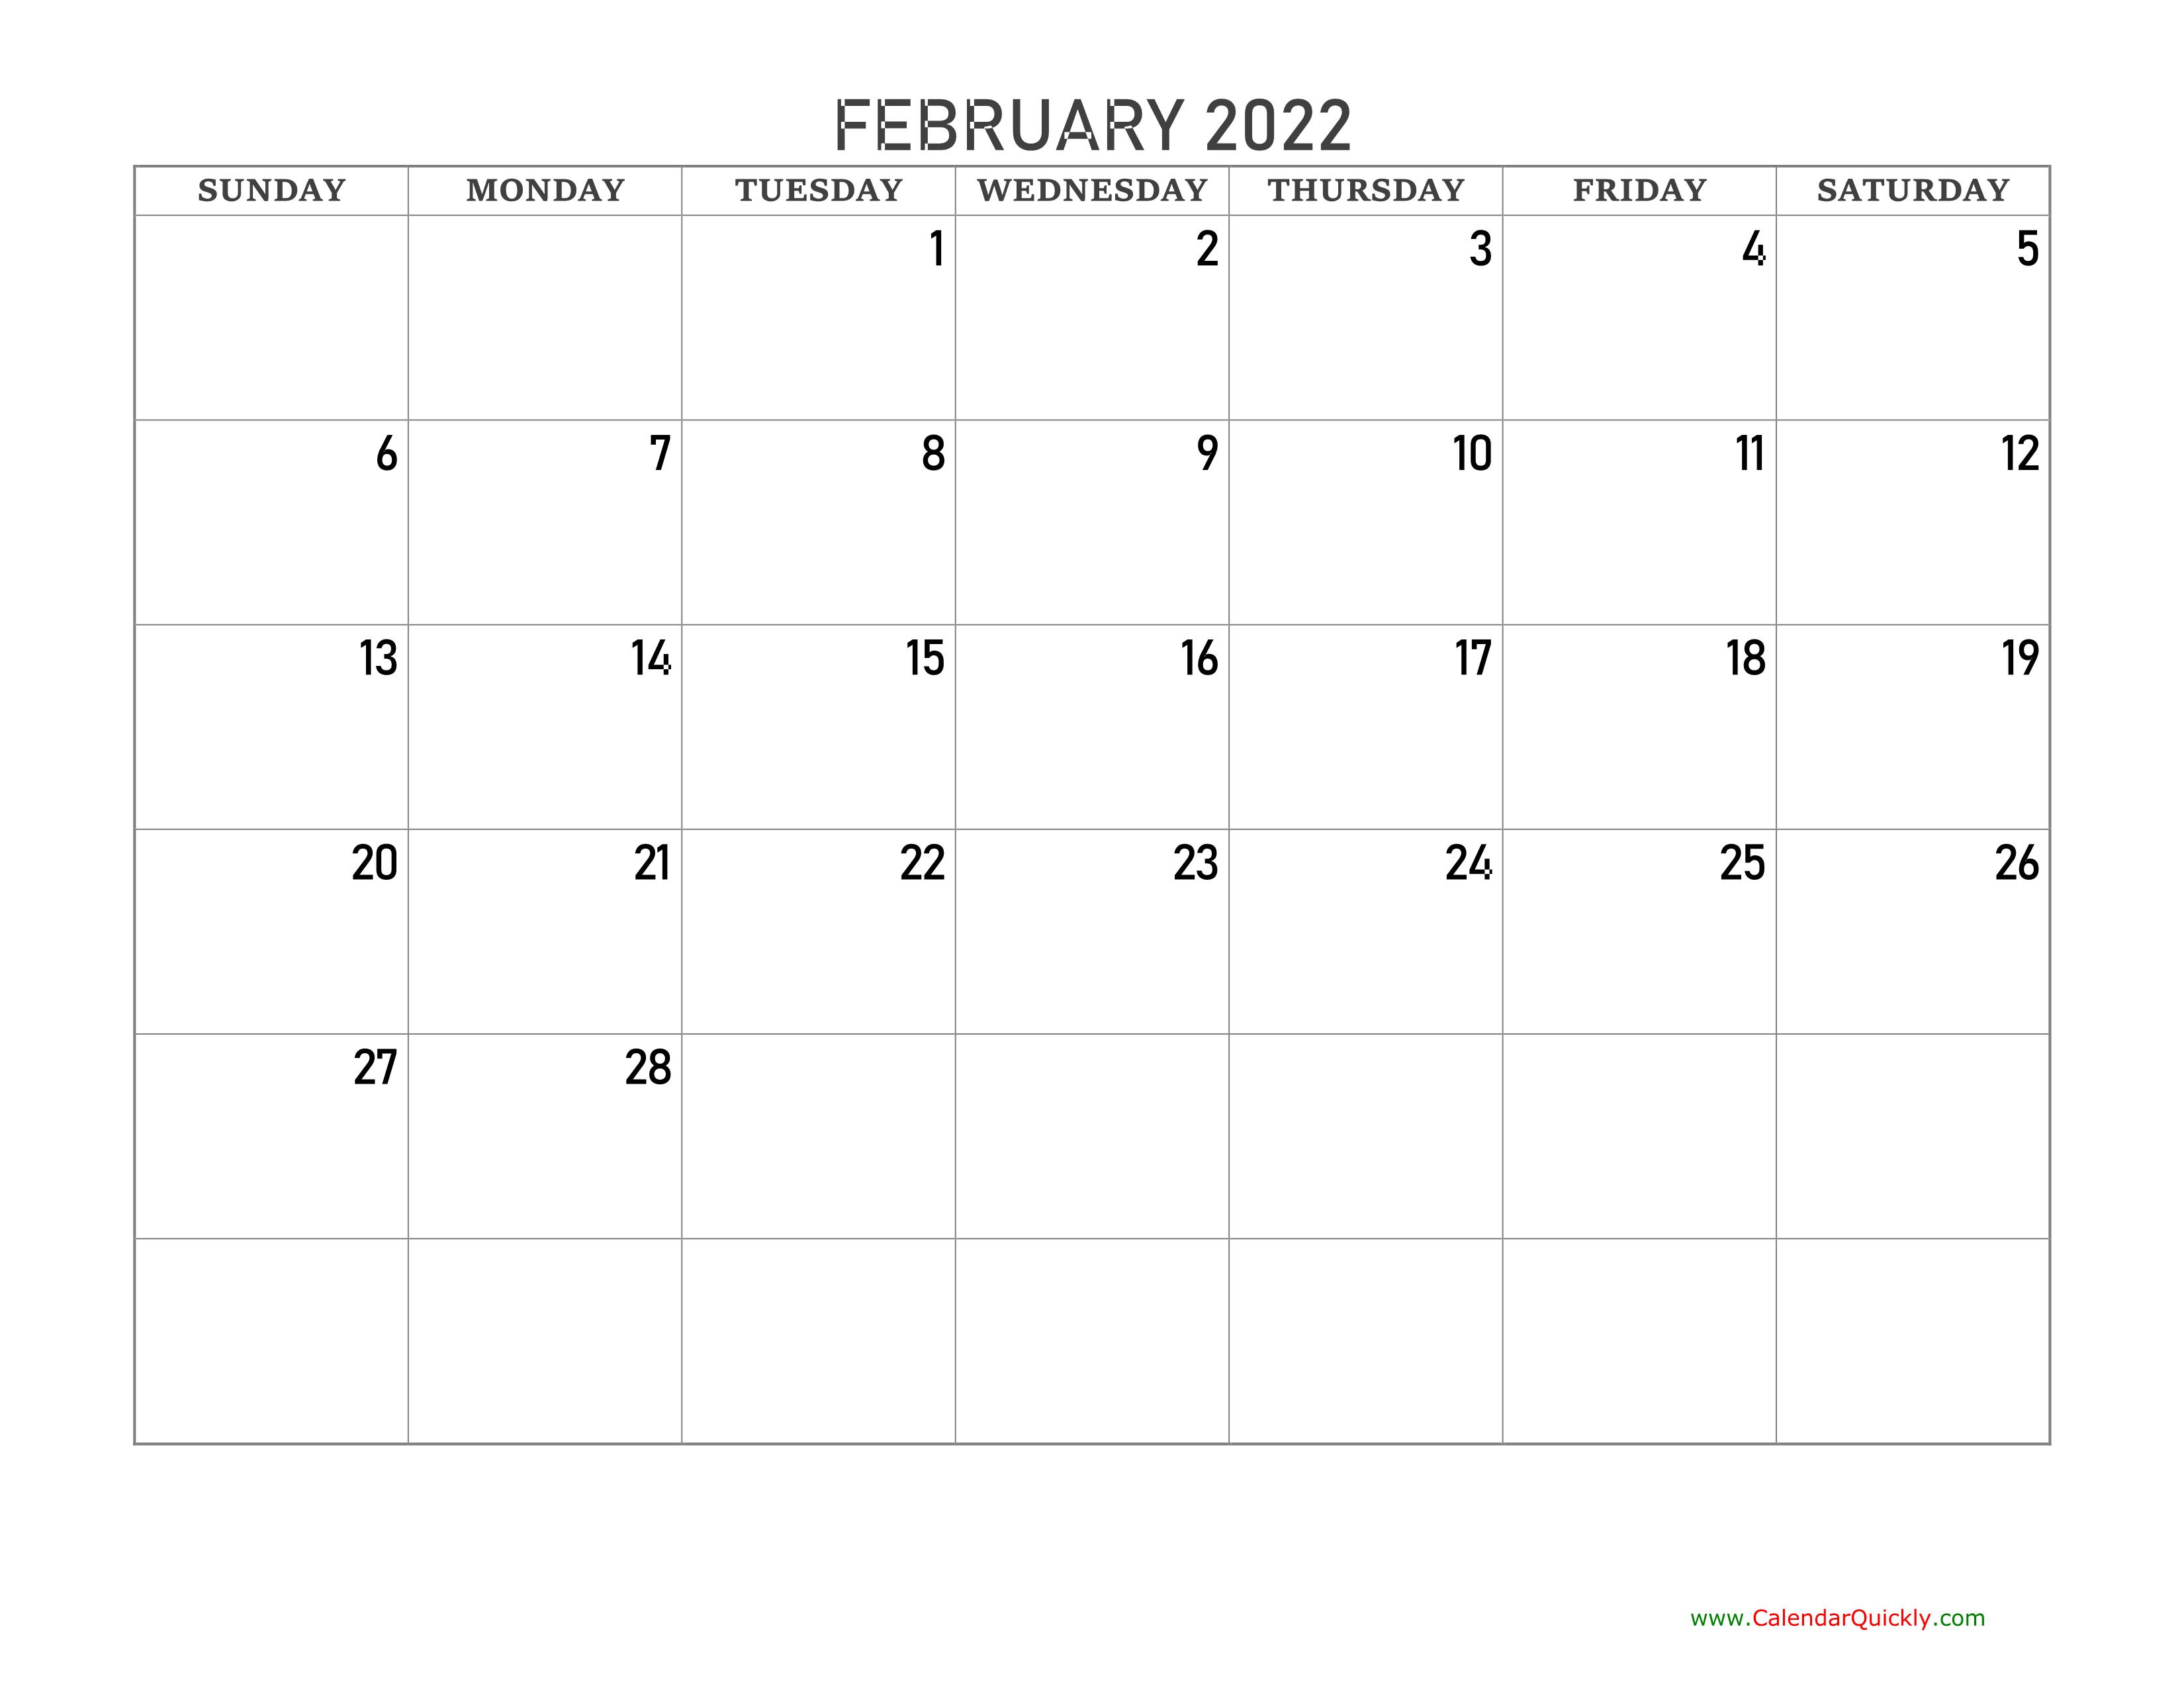 February 2022 Blank Calendar | Calendar Quickly